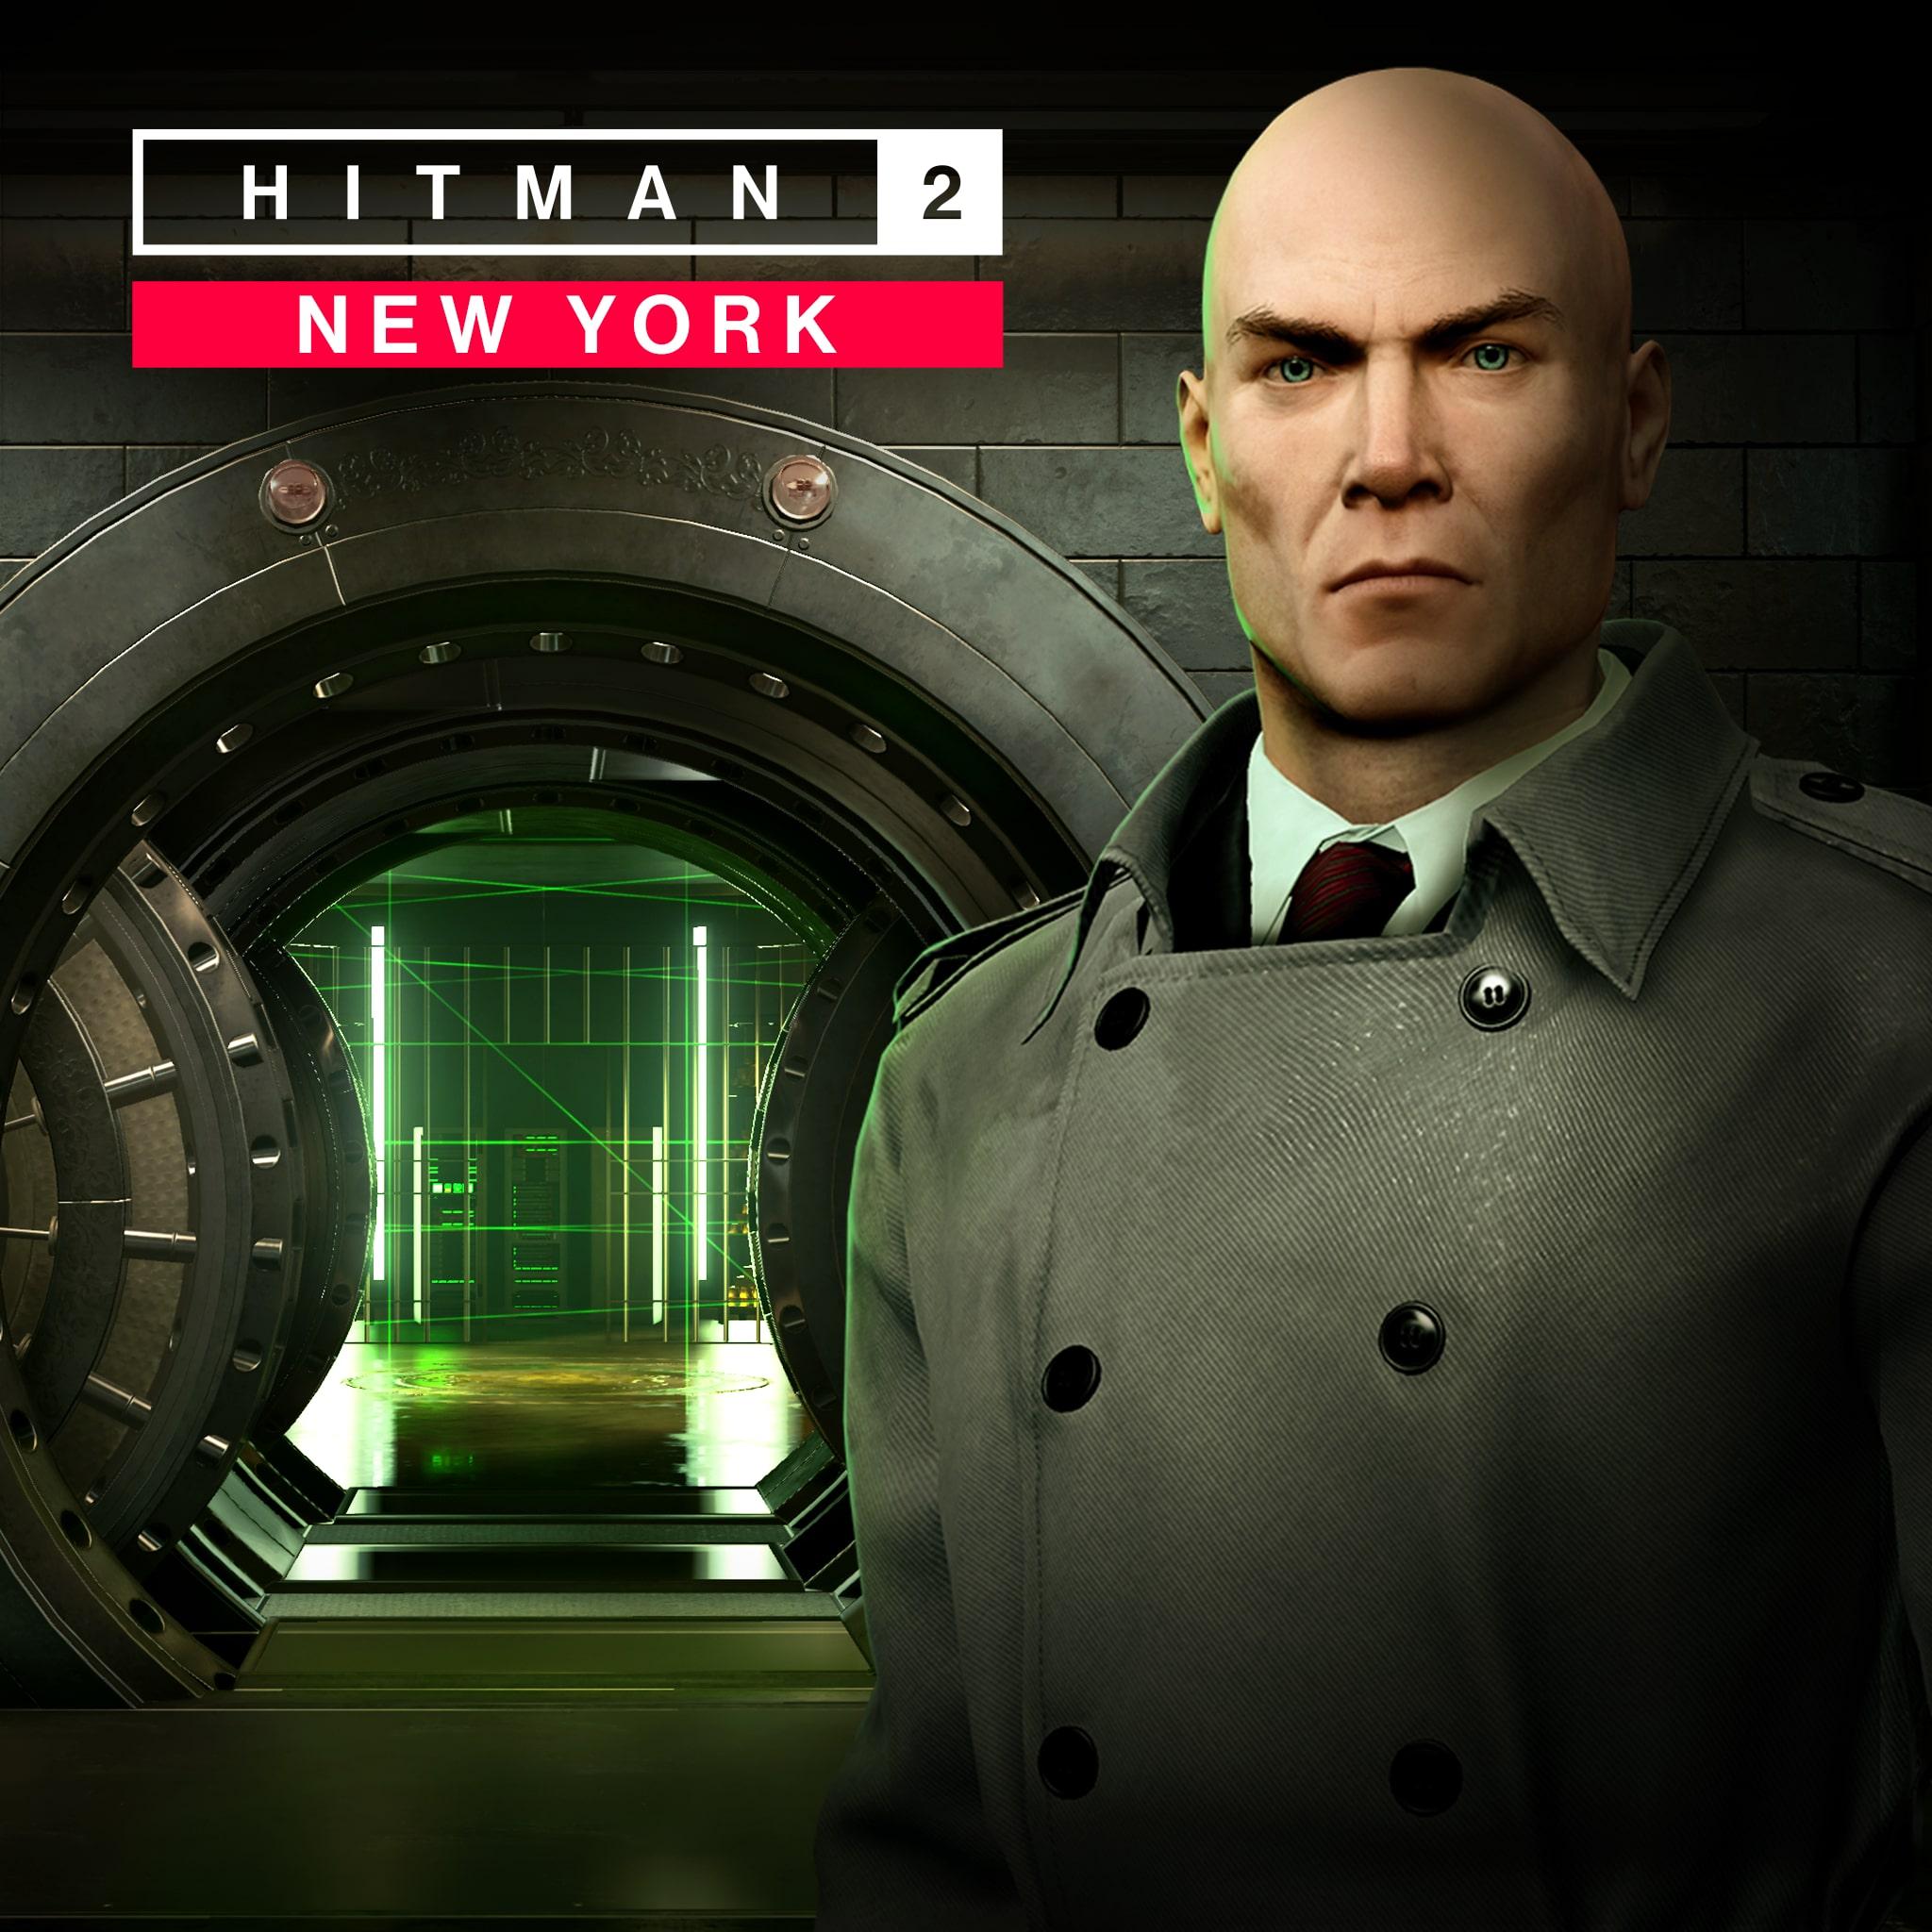 HITMAN™2 - Nowy Jork